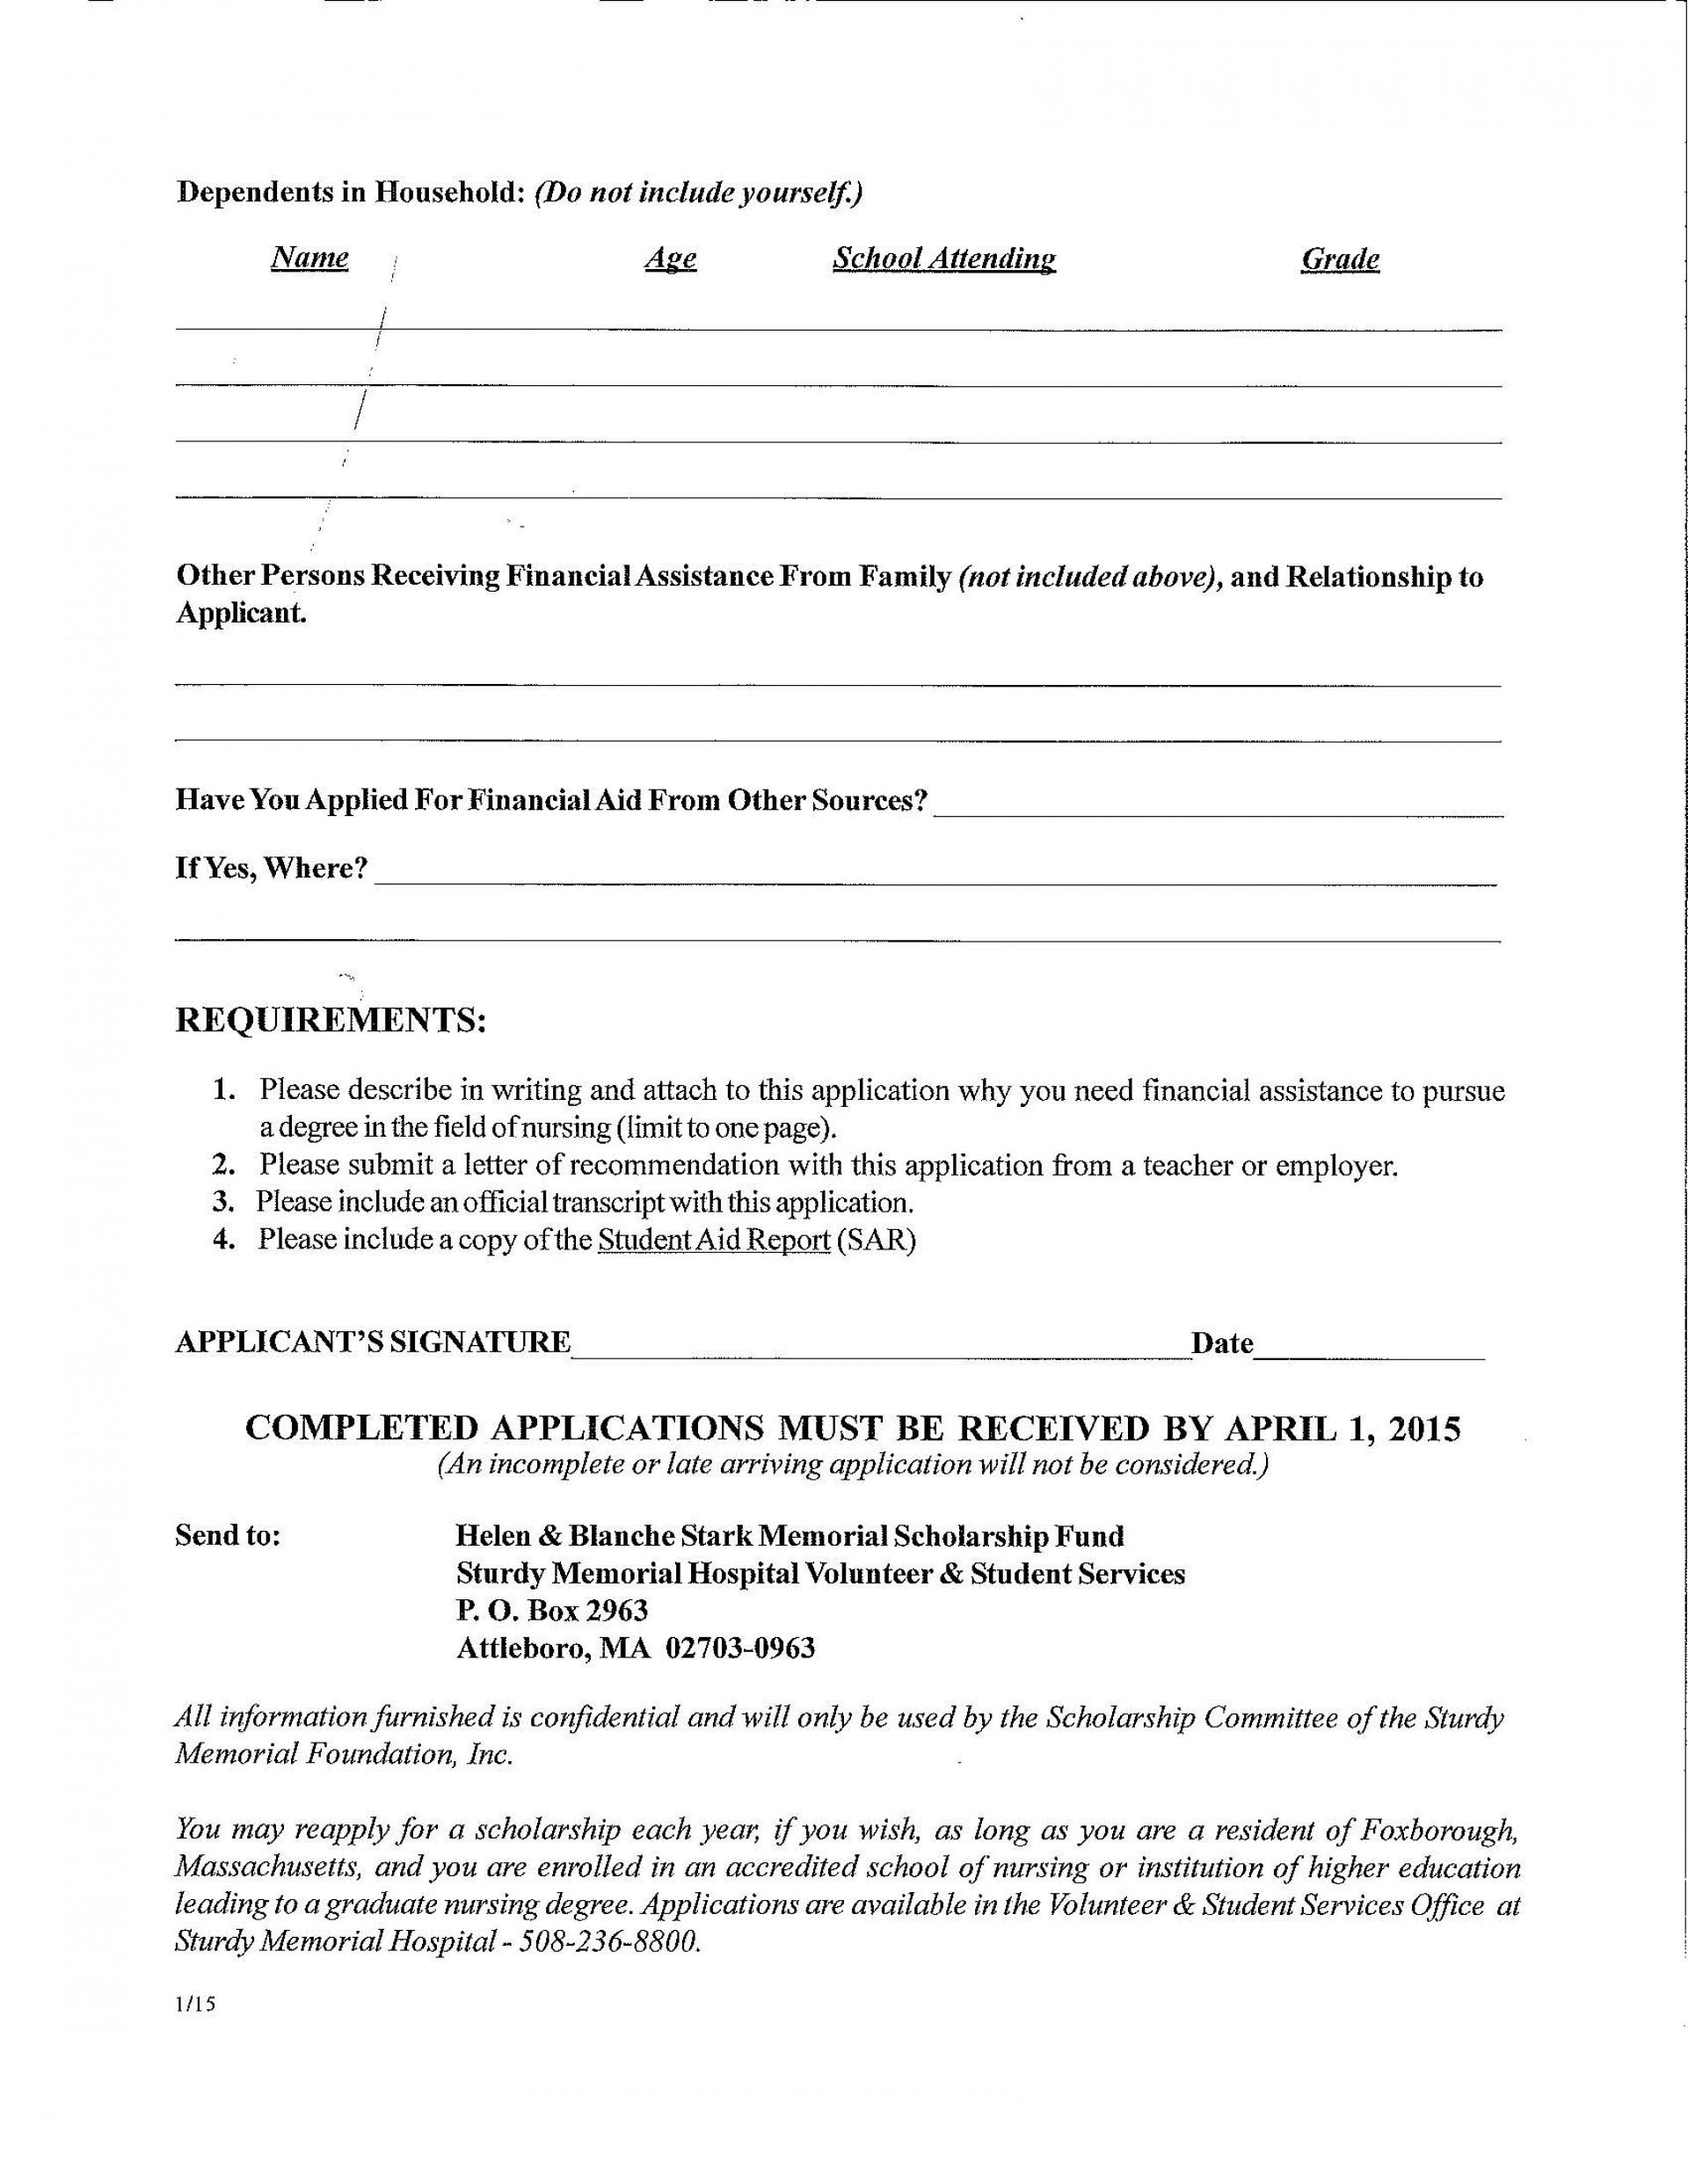 016 Essay Example Descriptive Thesis Helen Blanche Stark Memorial Scholarship Fund Application Page 2 Rare Statement Generator Pdf 1920